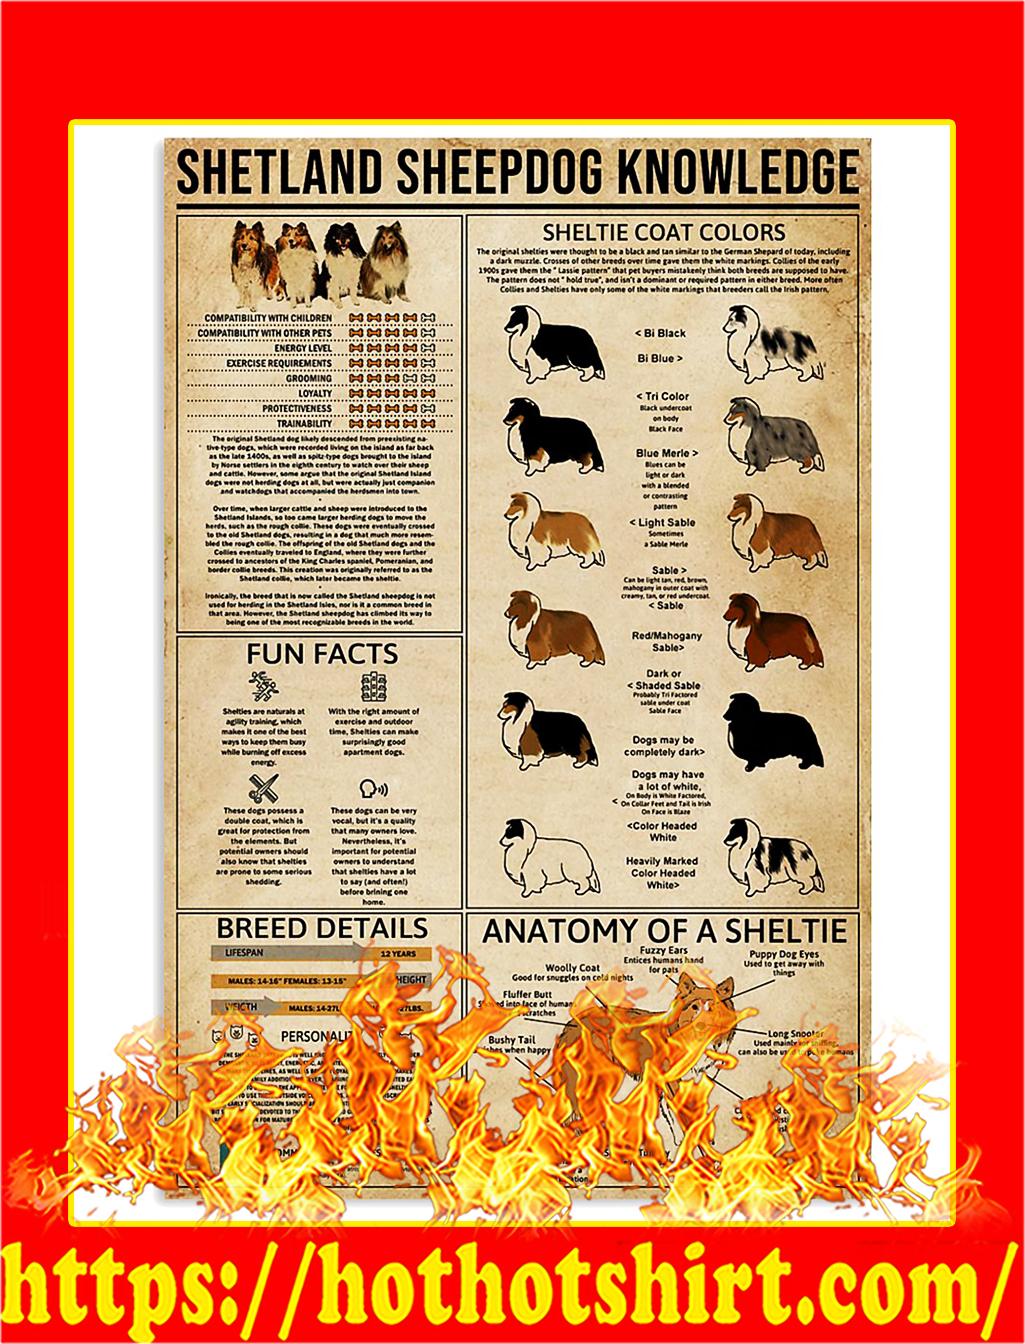 Shetland Sheepdog Knowledge Poster